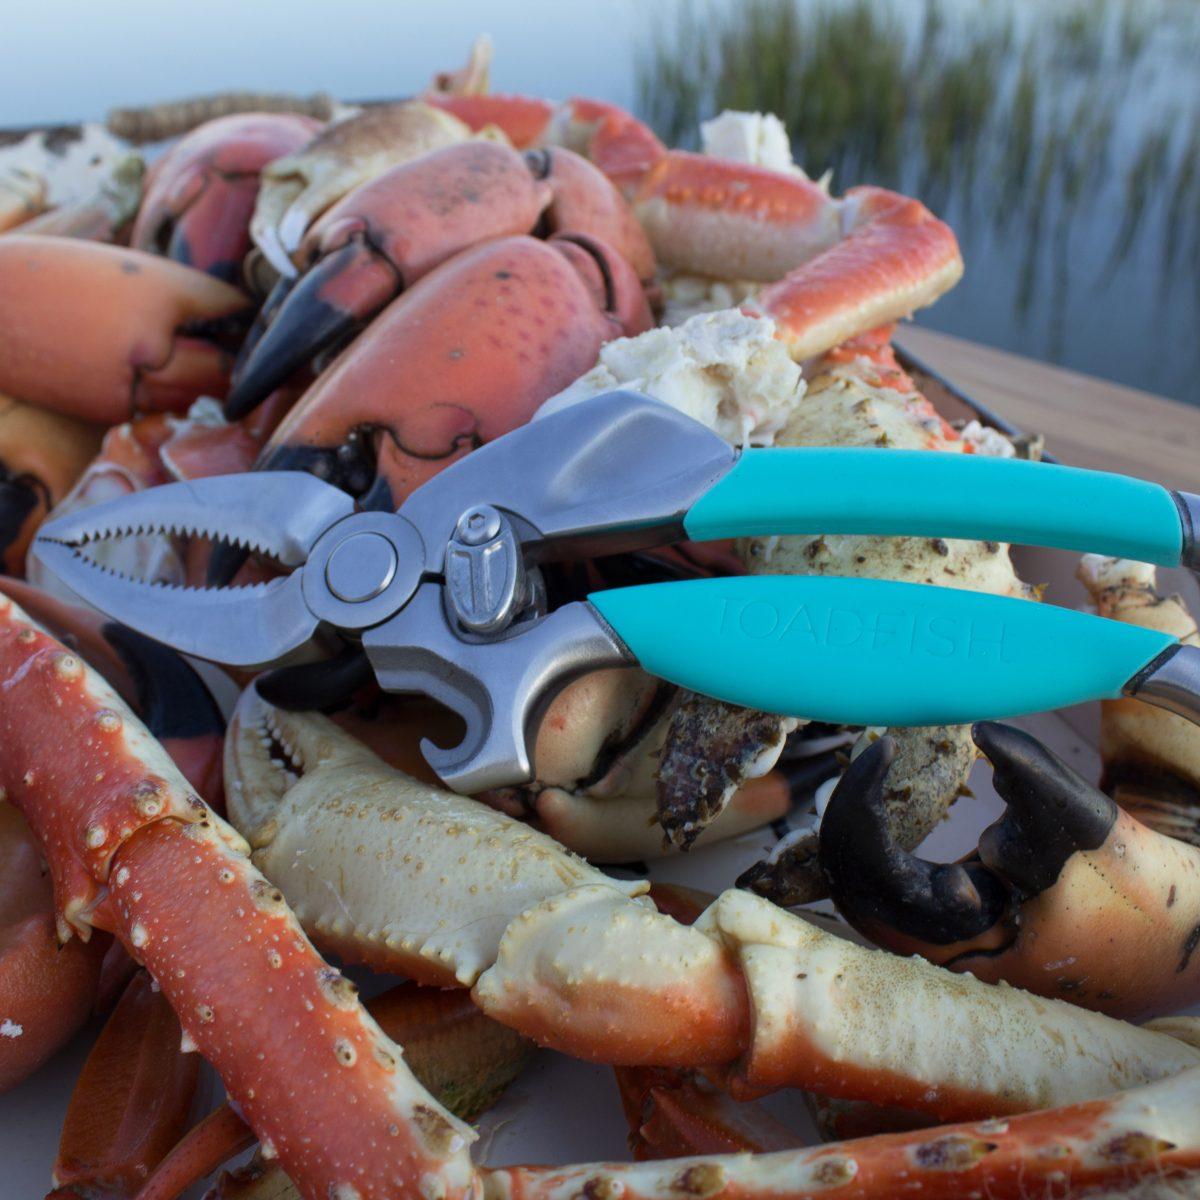 toadfish crab tool